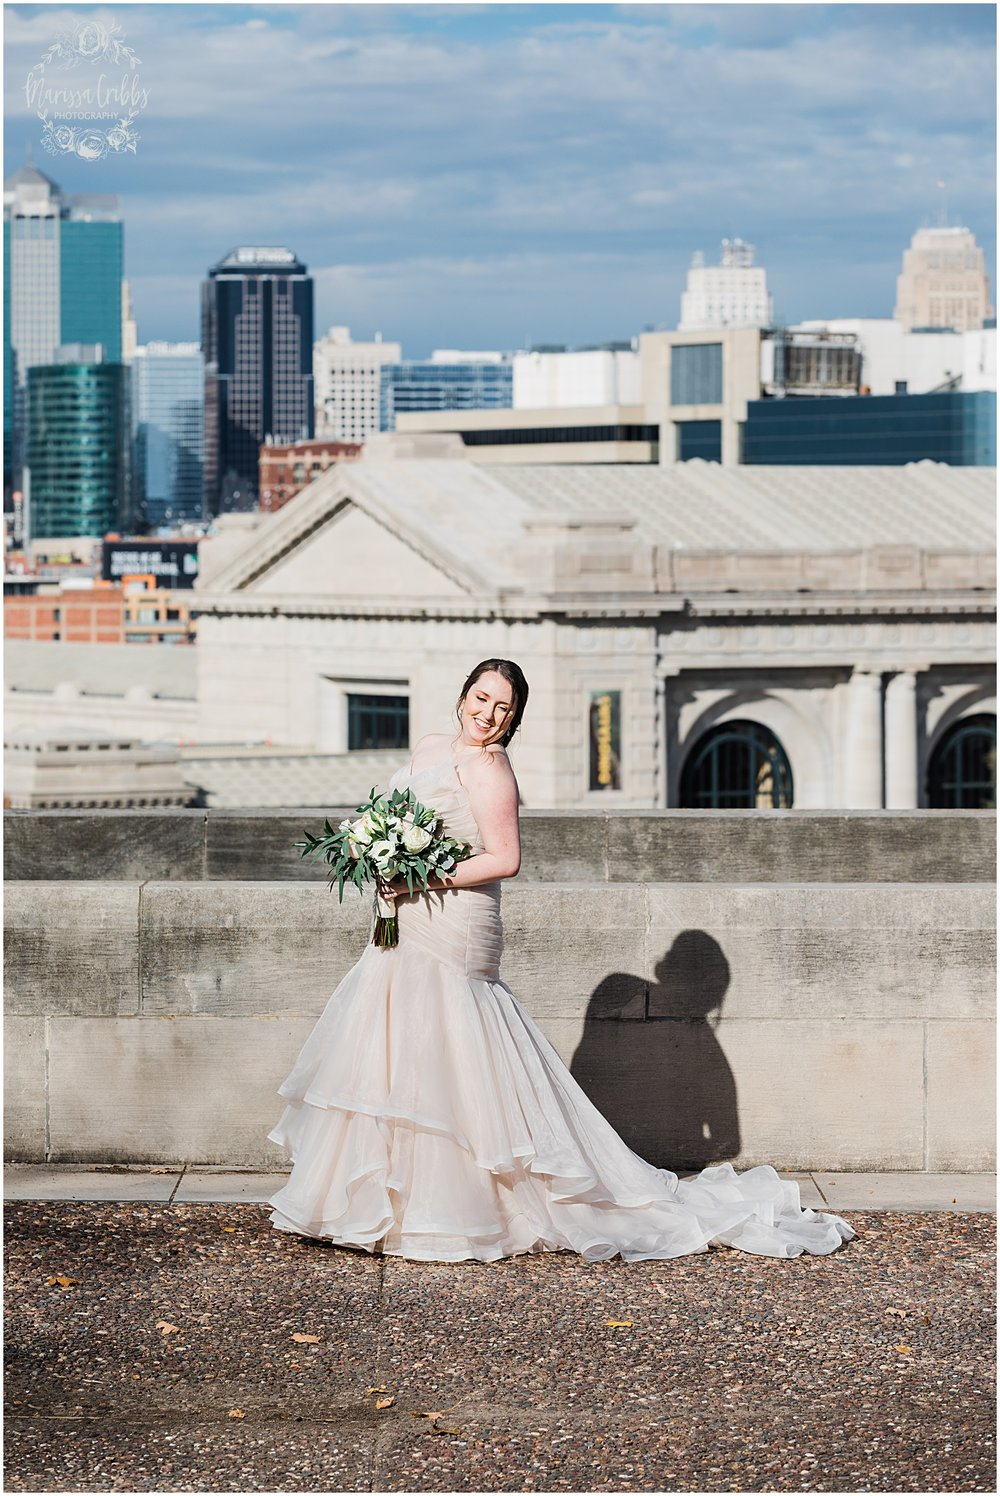 JULIA & AUSTIN MADRID THEATRE WEDDING | MARISSA CRIBBS PHOTOGRAPHY_7110.jpg